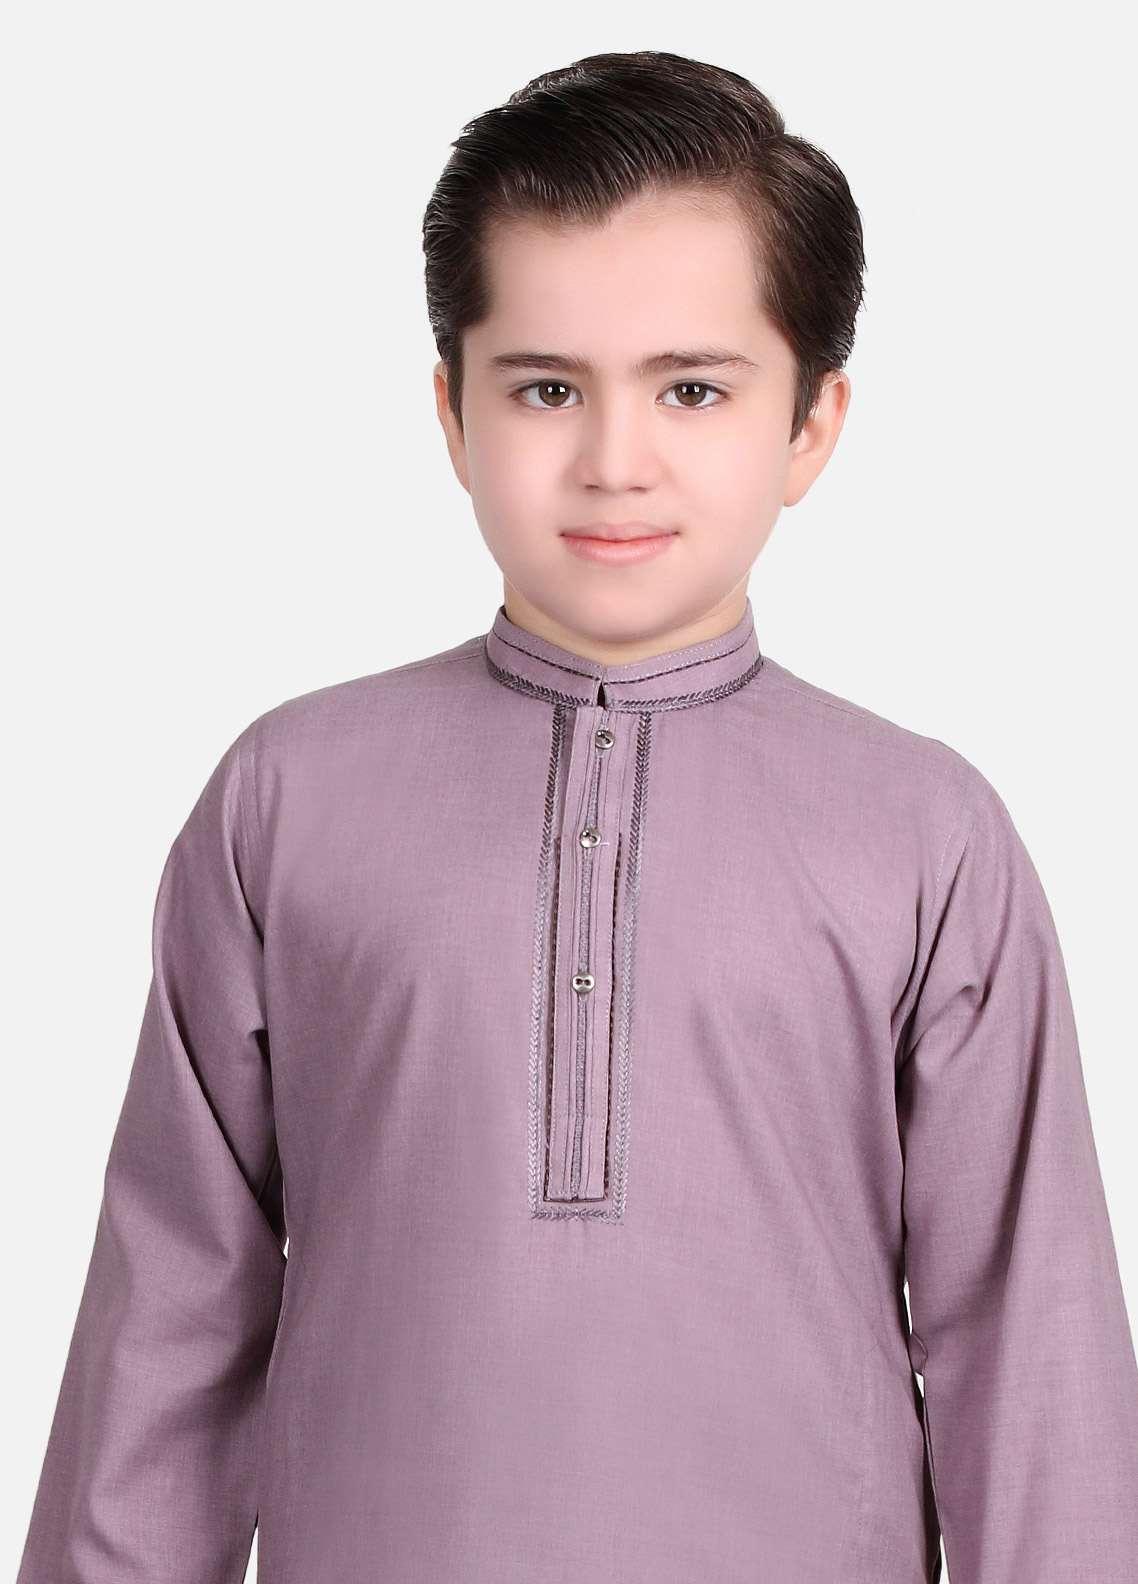 Edenrobe Cotton Embroidered Boys Kameez Shalwar - Purple EDS18B 3533